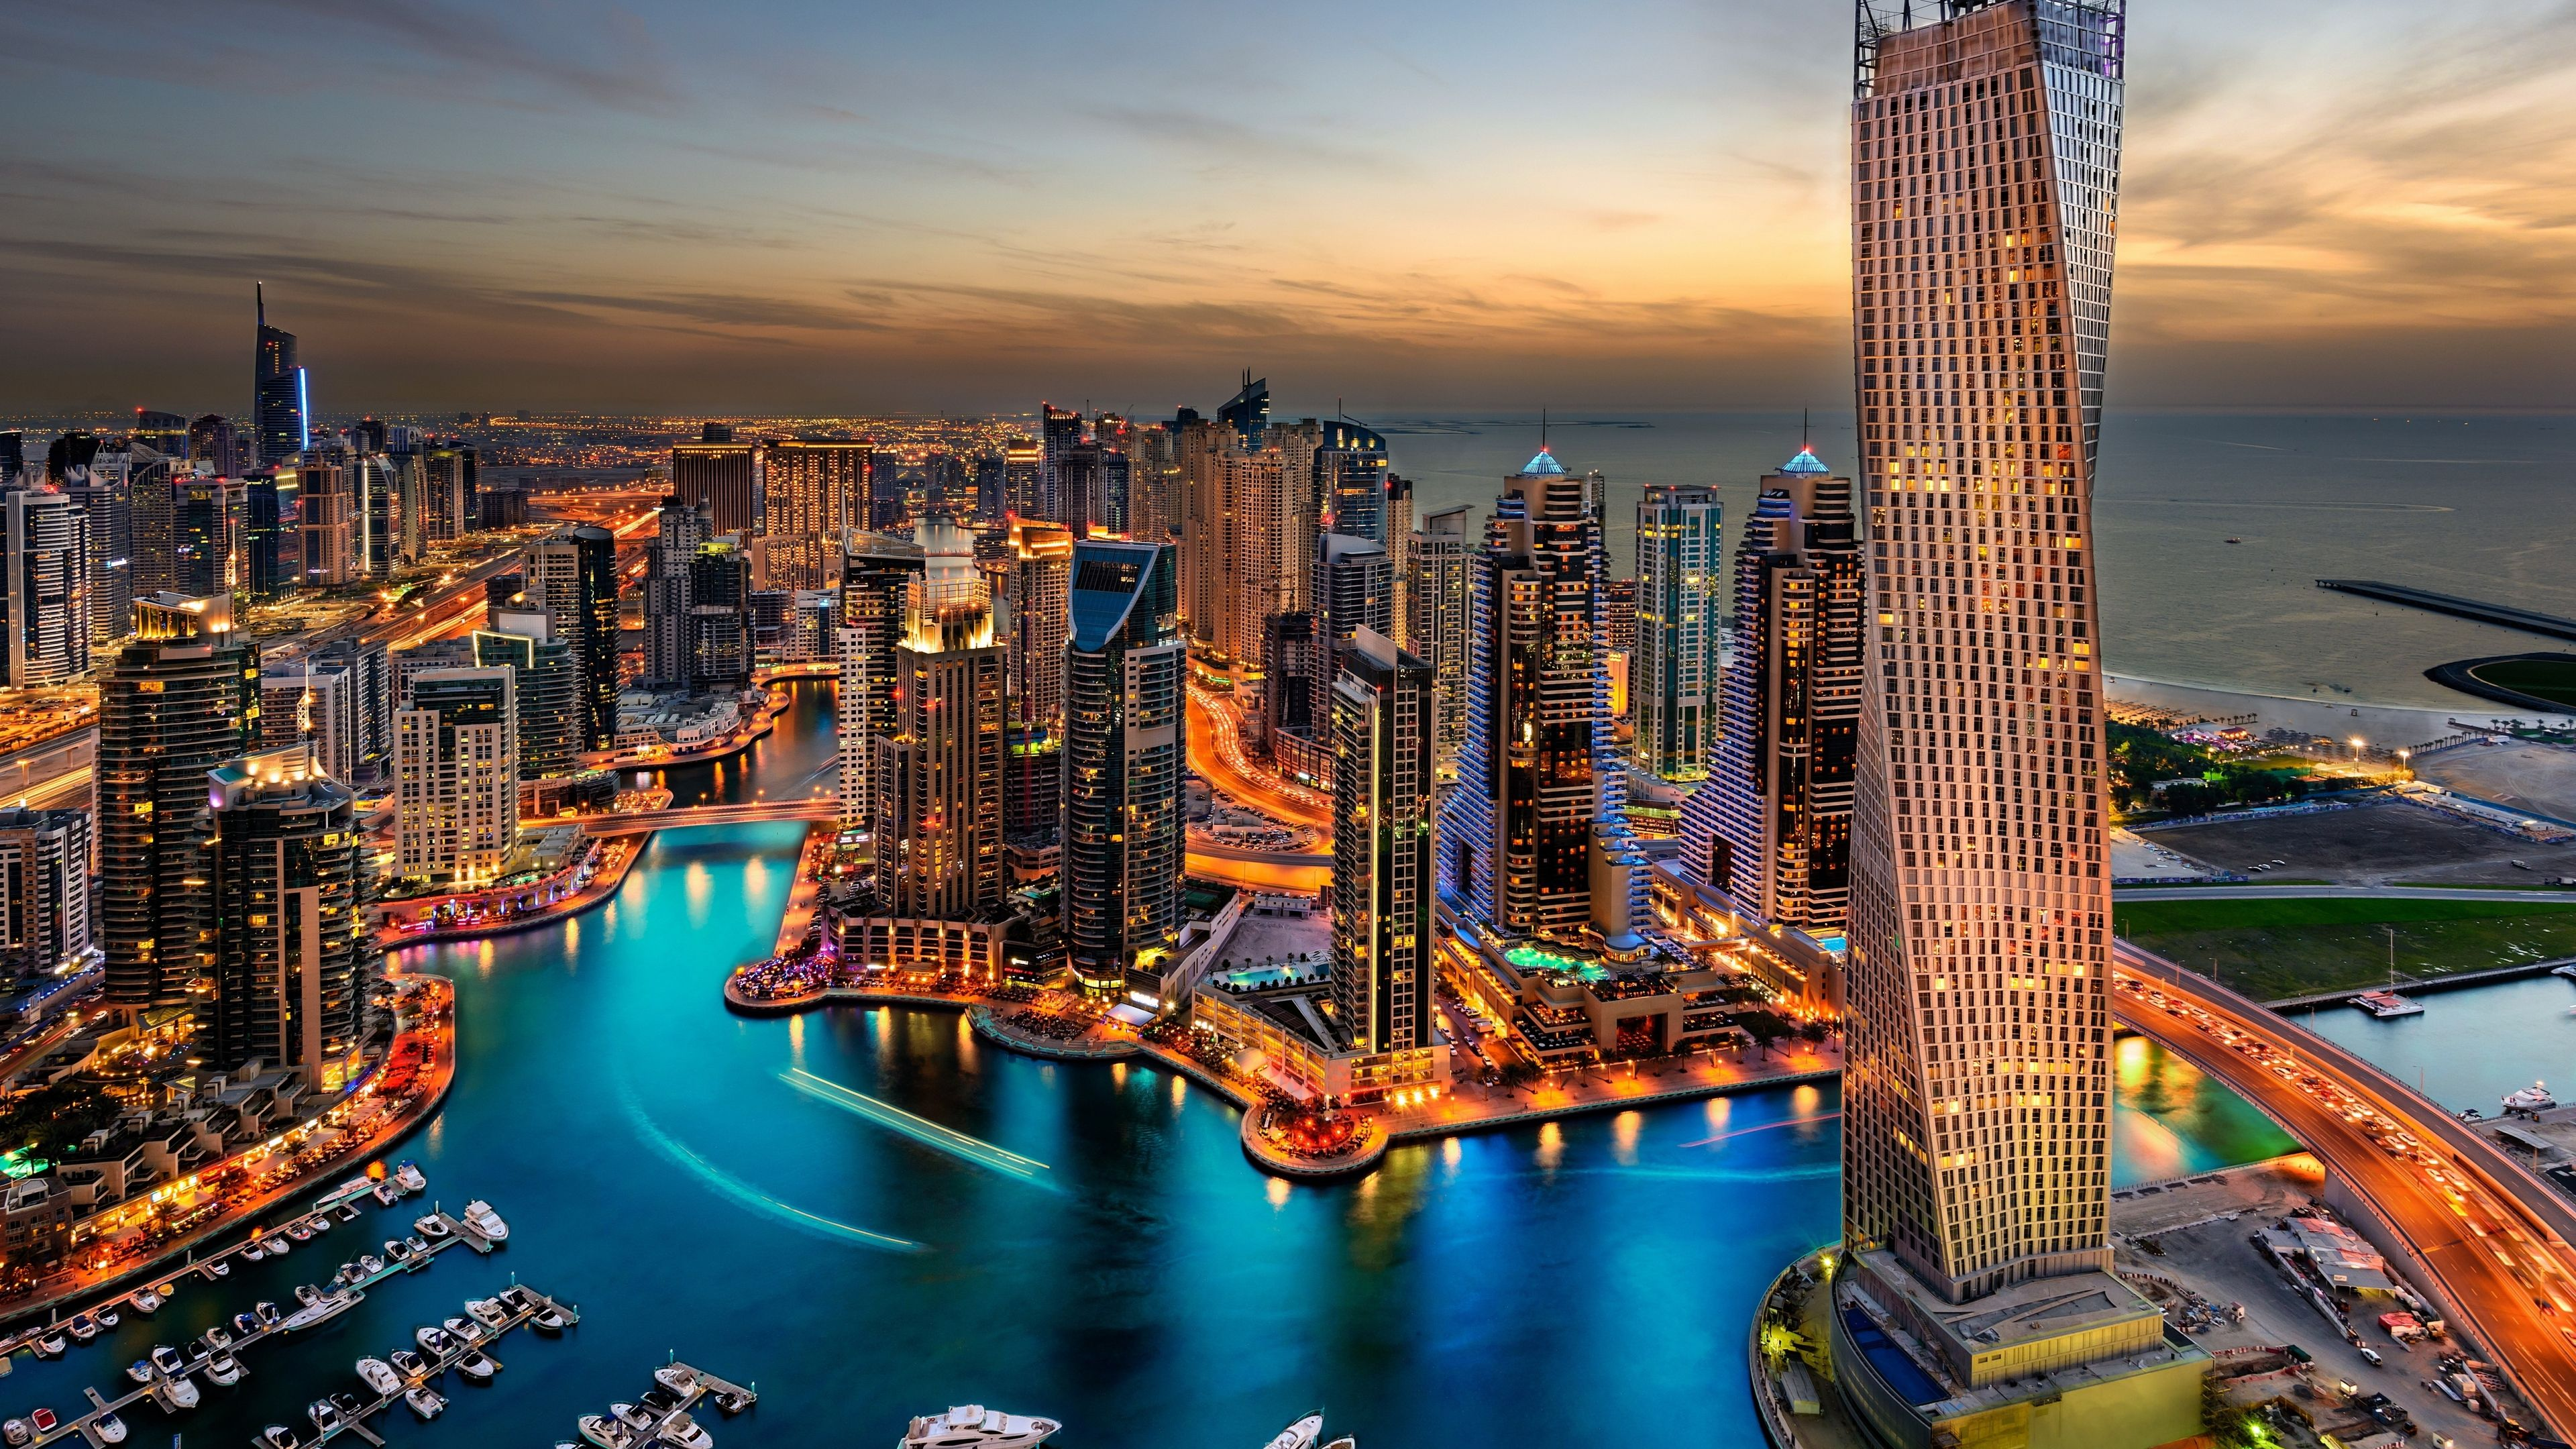 Ultra Hd Wallpapers 4k Dubai City Dubai Holidays Dubai Skyscraper